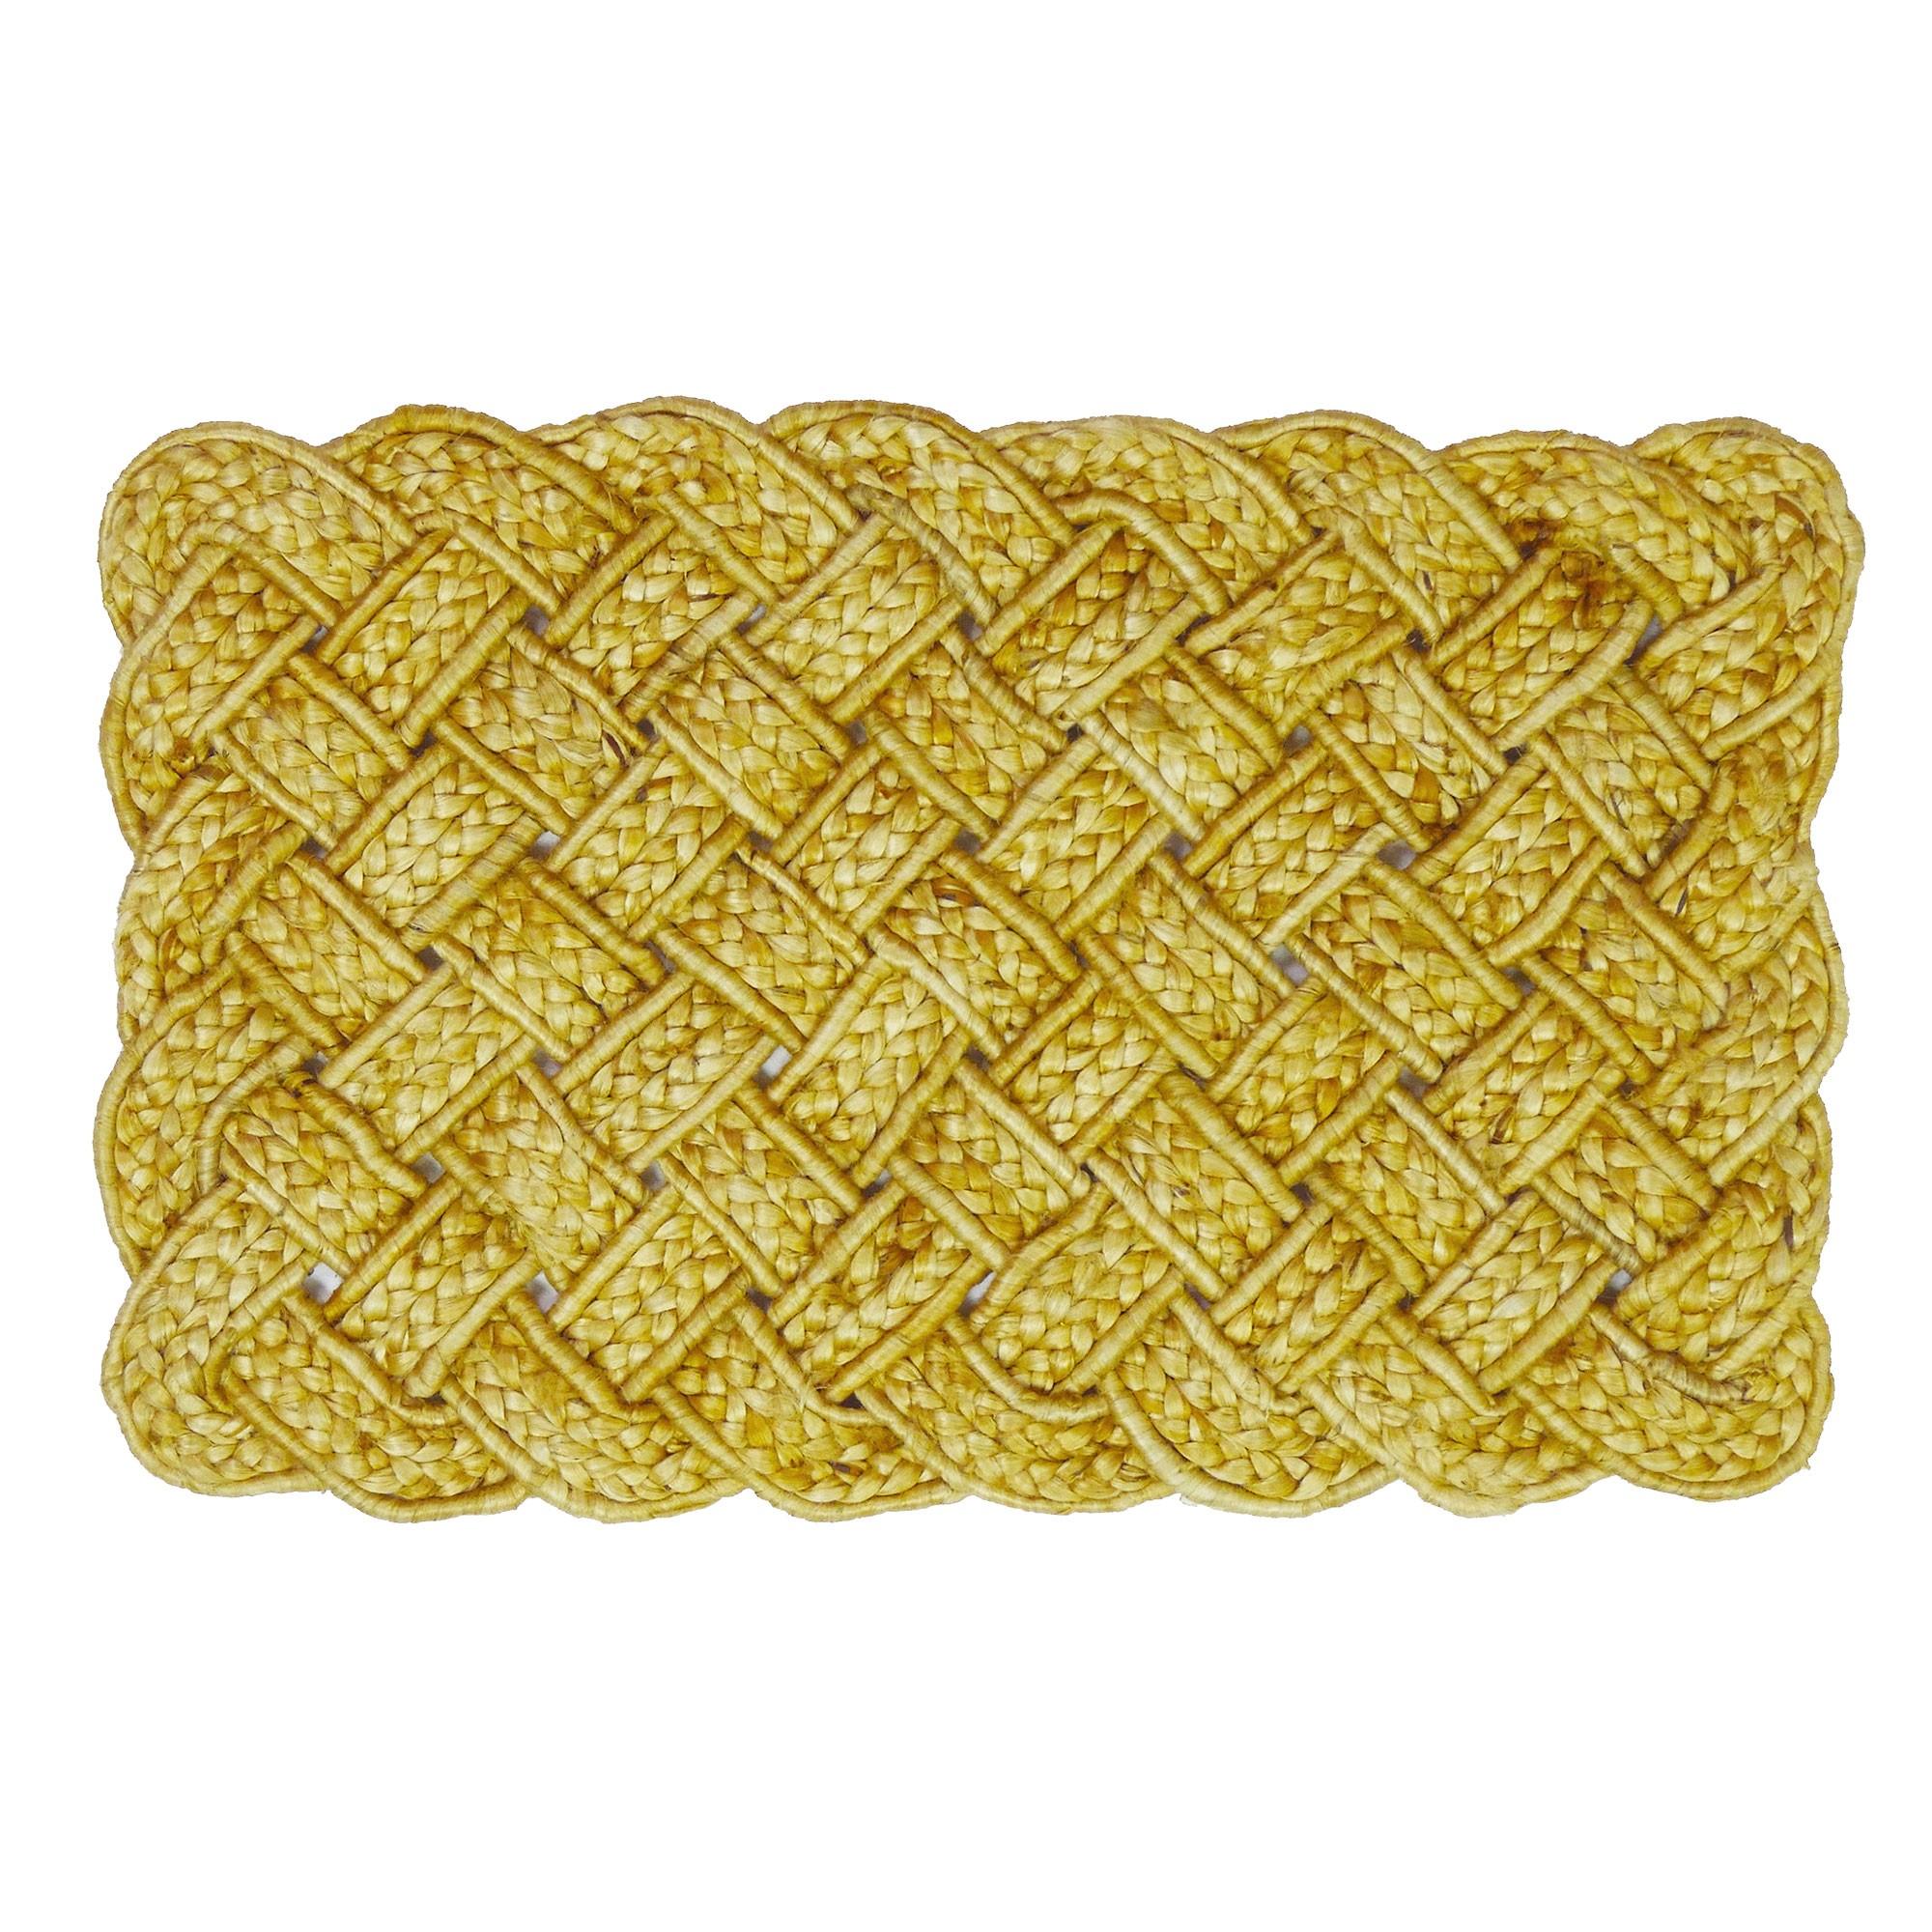 Valentina Handspun Coiled Yarn Jute Doormat, 80x50cm